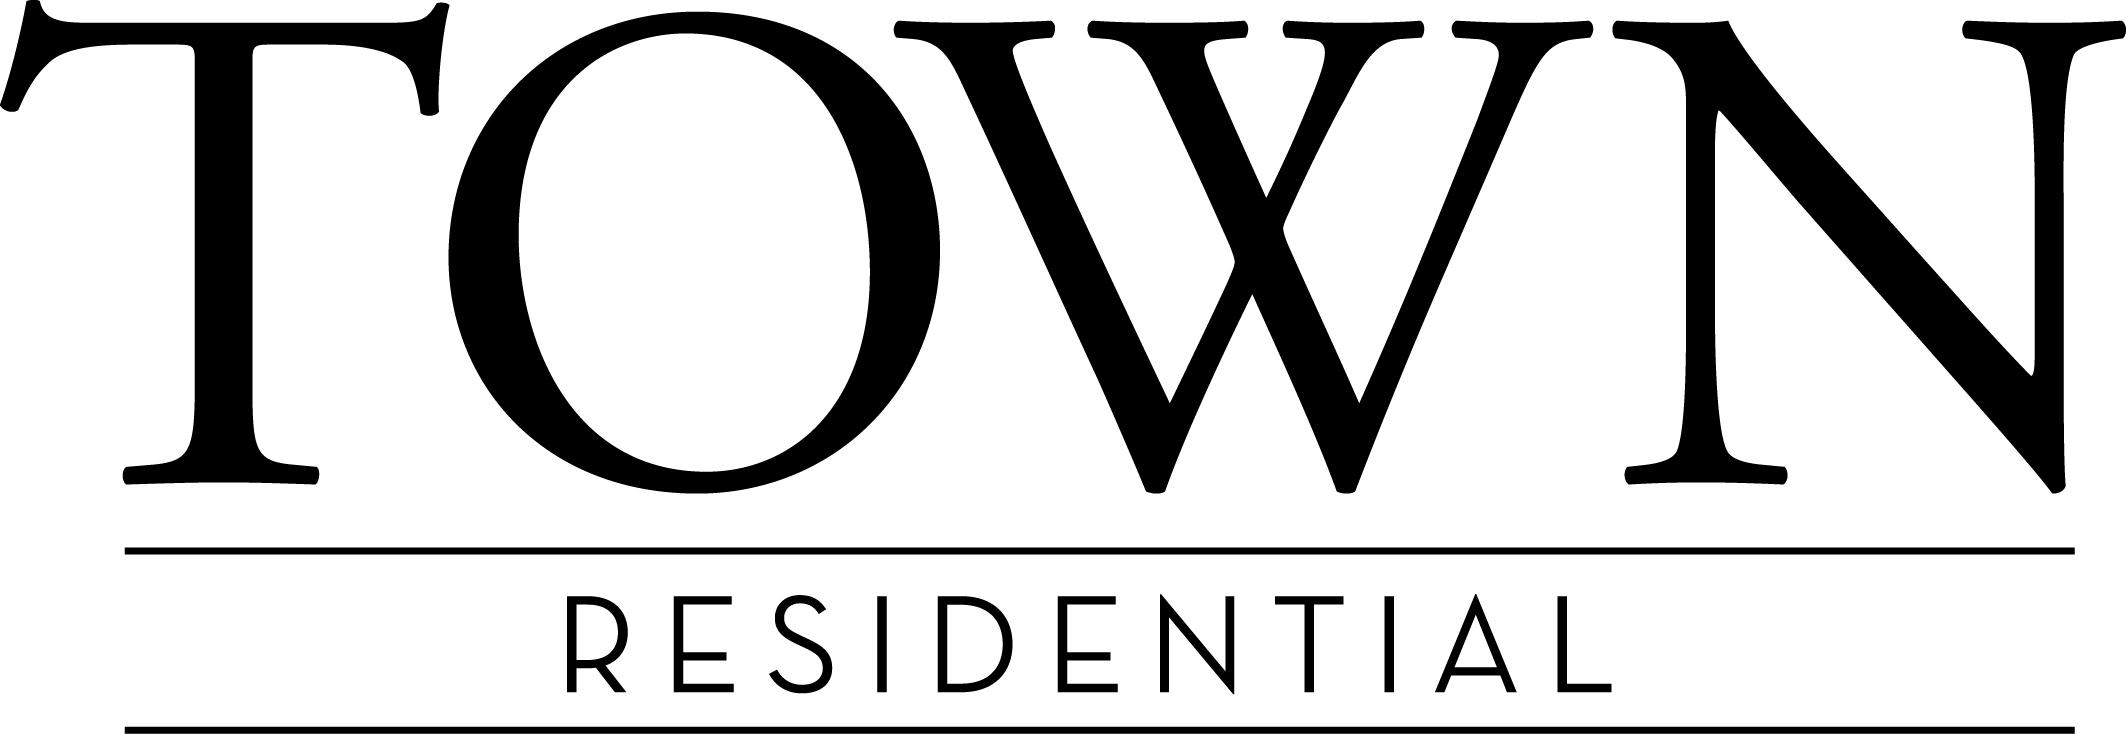 town_corporate_logo.jpg